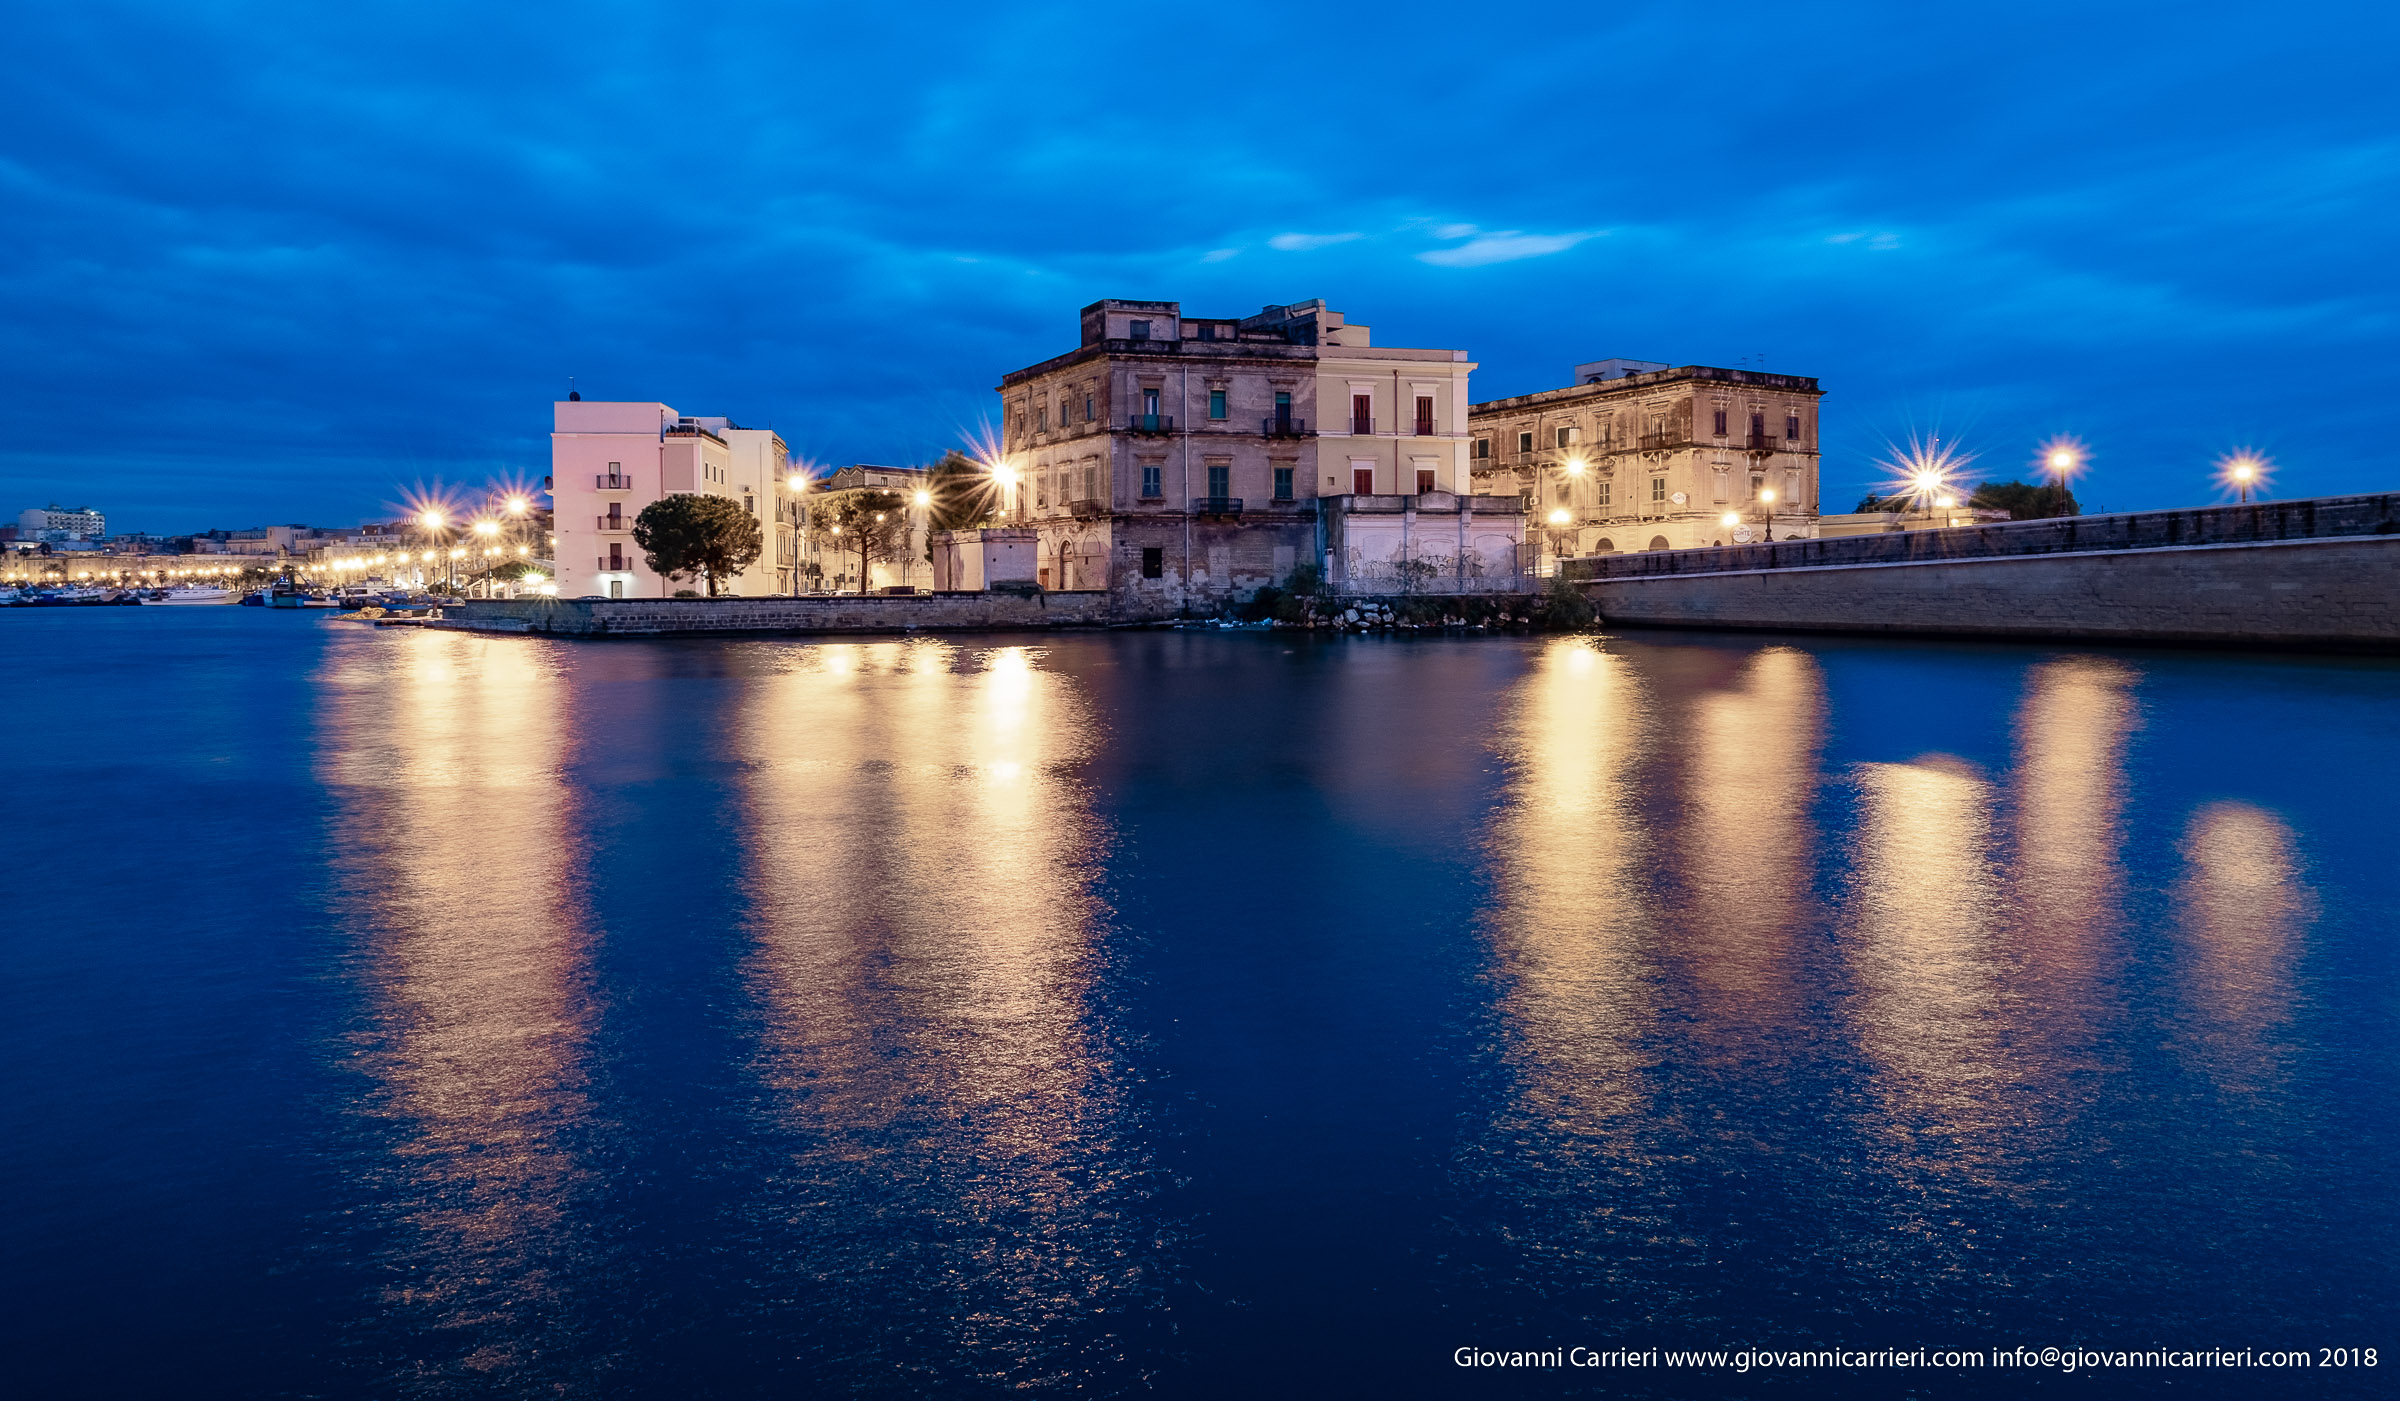 Vista notturna del borgo antico, Taranto